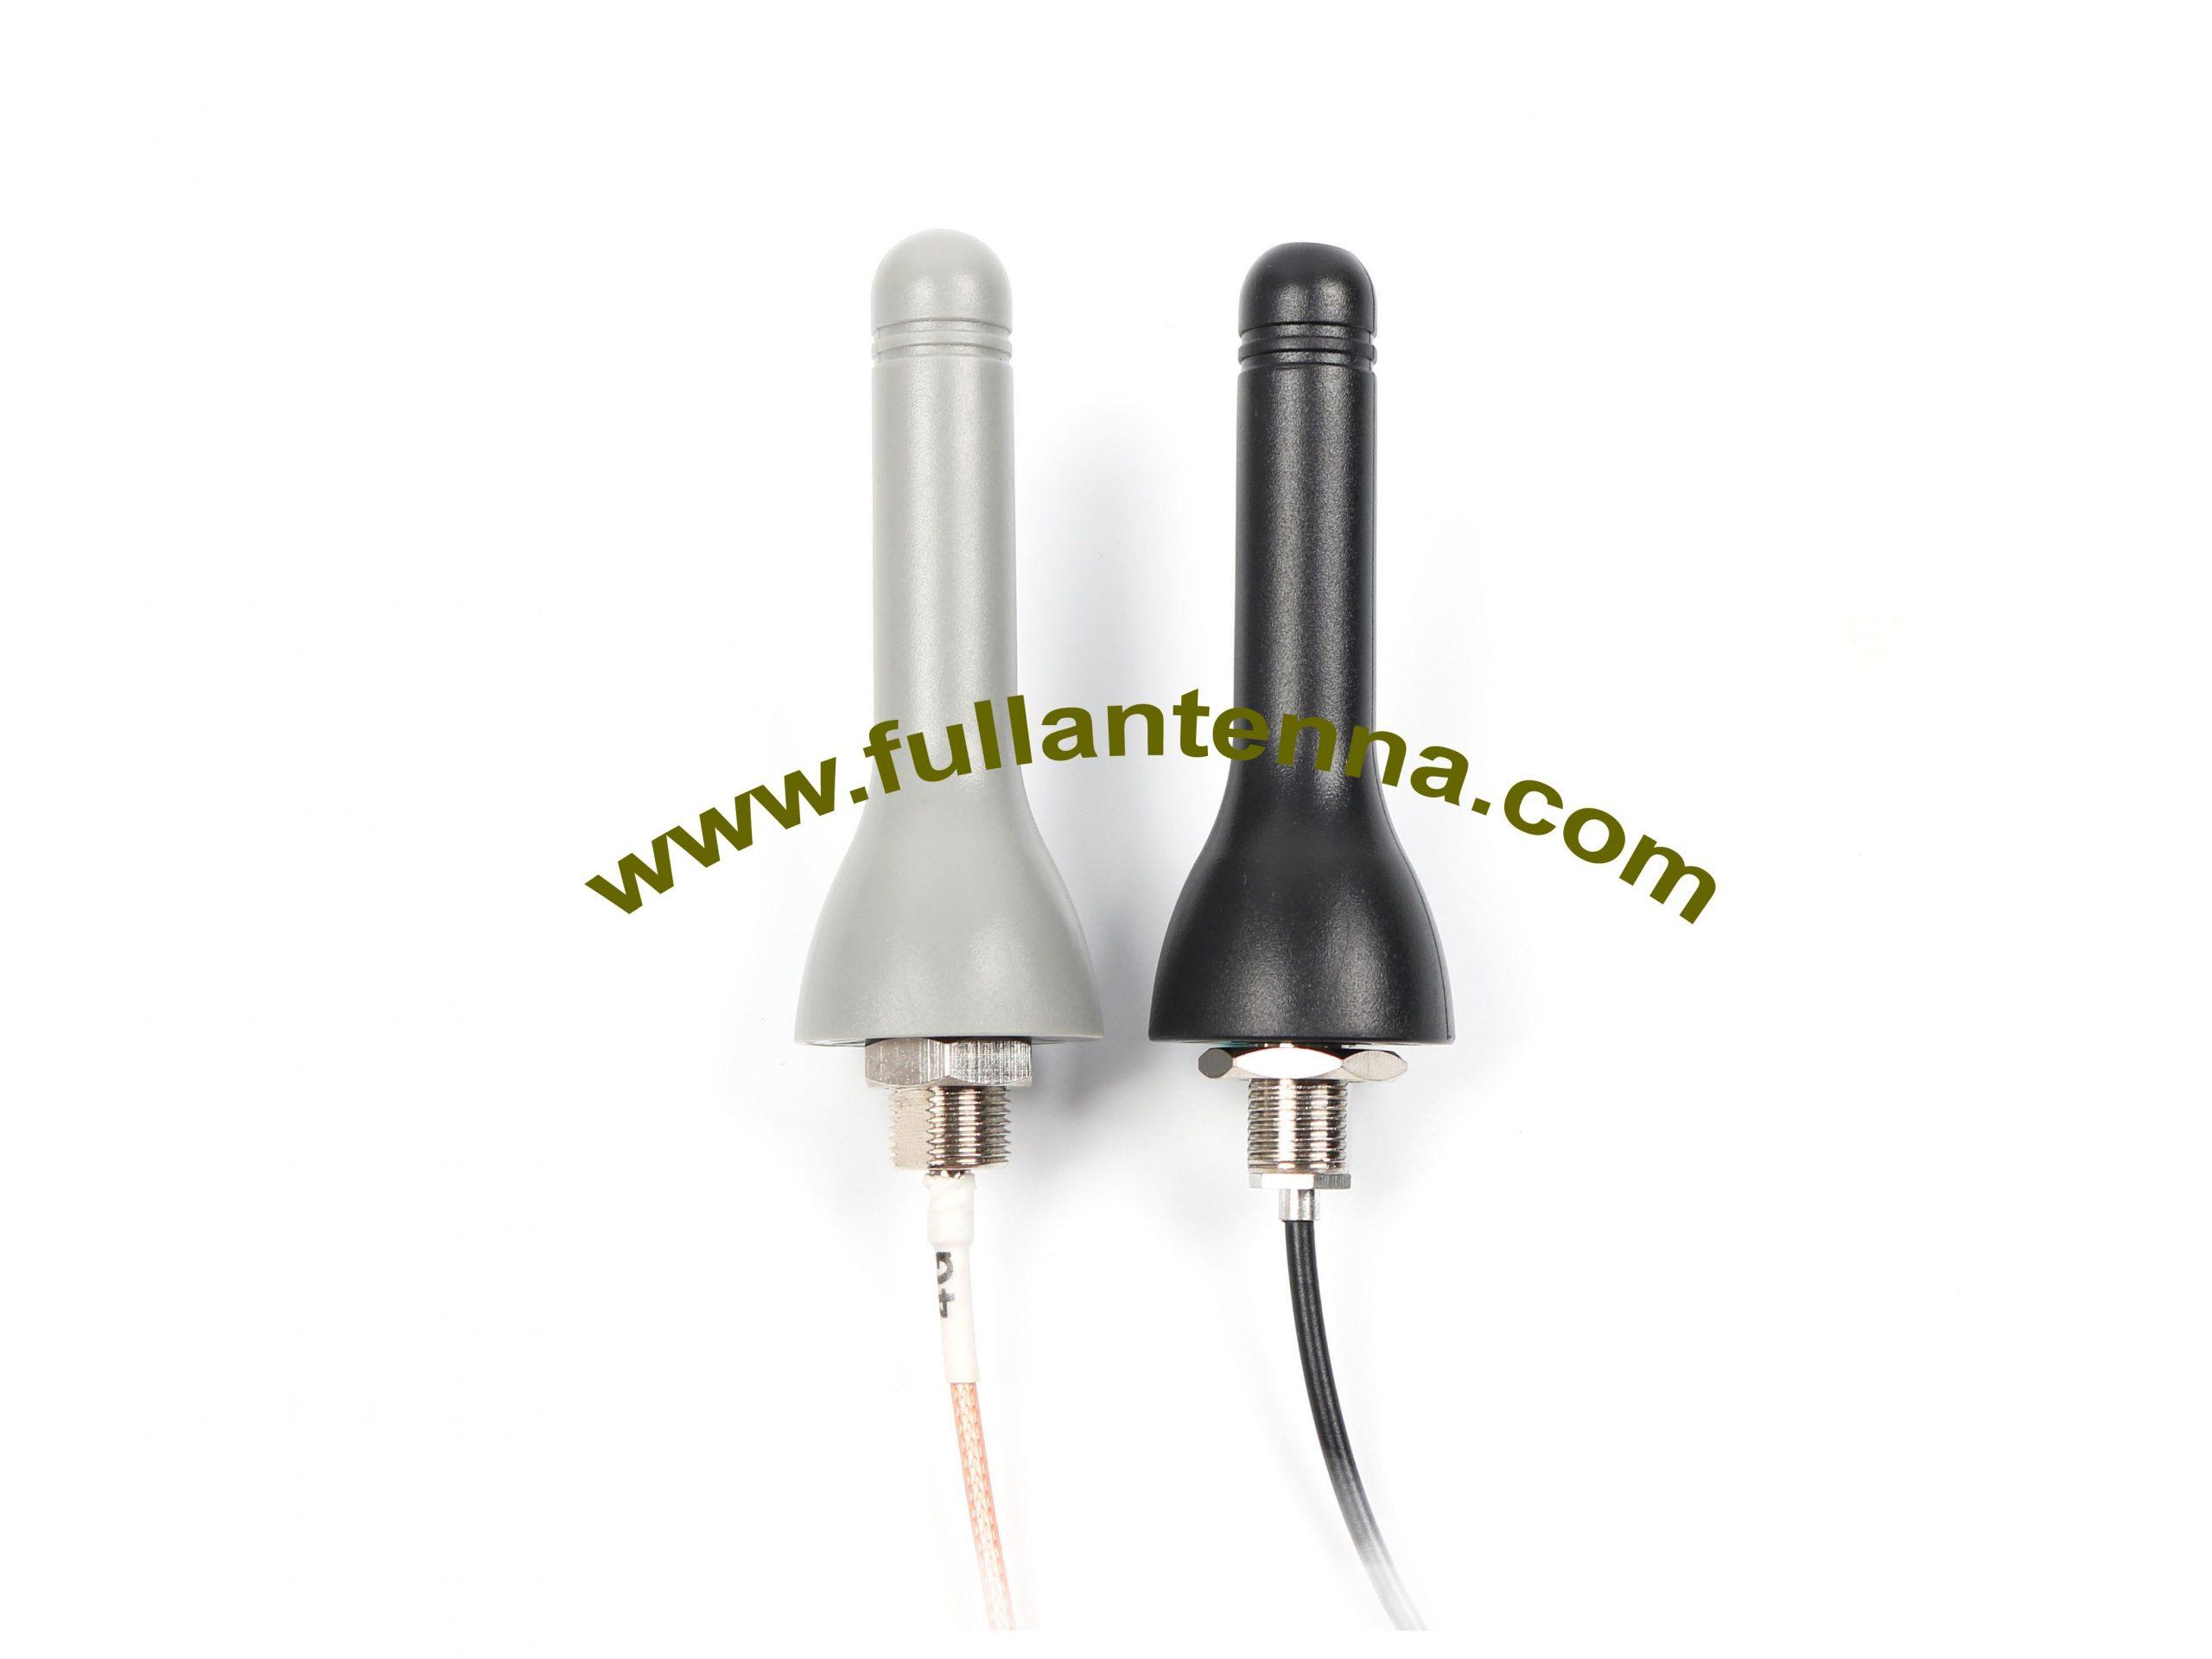 P/N:FA2400.0801,WiFi/2.4G External Antenna,SCREW mount antenna, housing Black or grey color